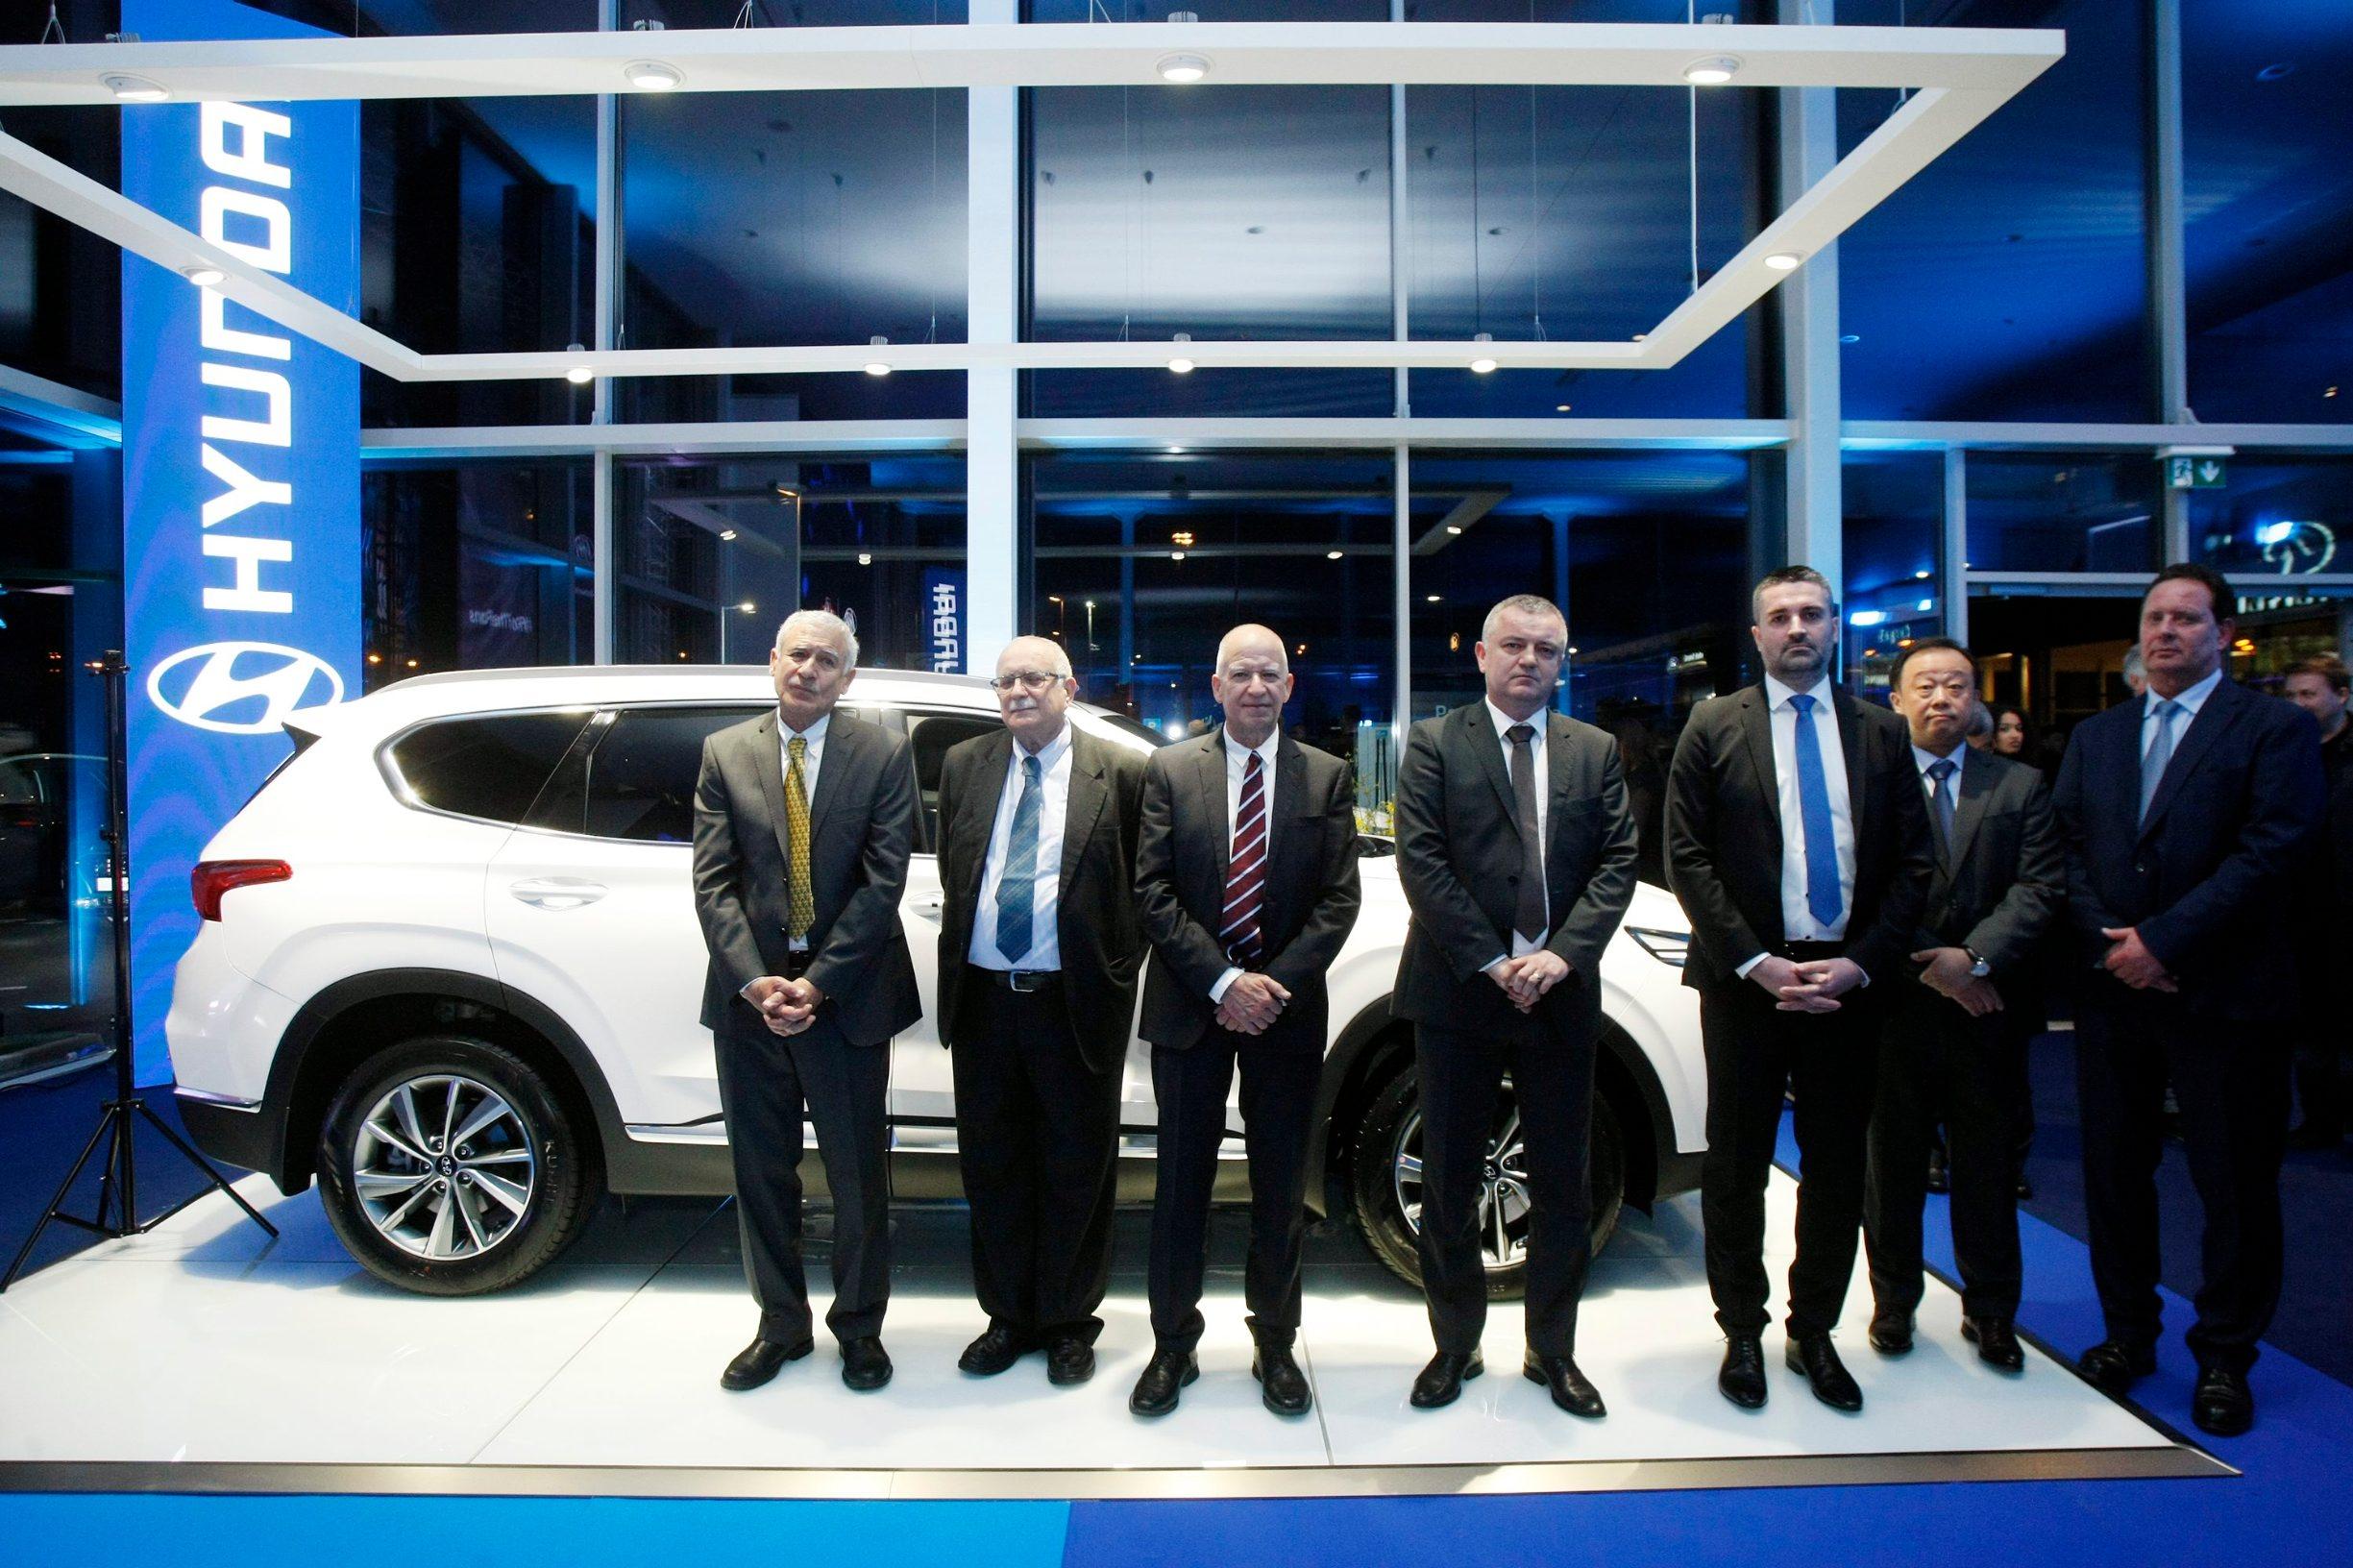 Svečano otvorenje novog Hyundai salona, Zviku Livnat, Darko Horvat, Lovro Živković, Dongwoo Choi, Thomas Schmid